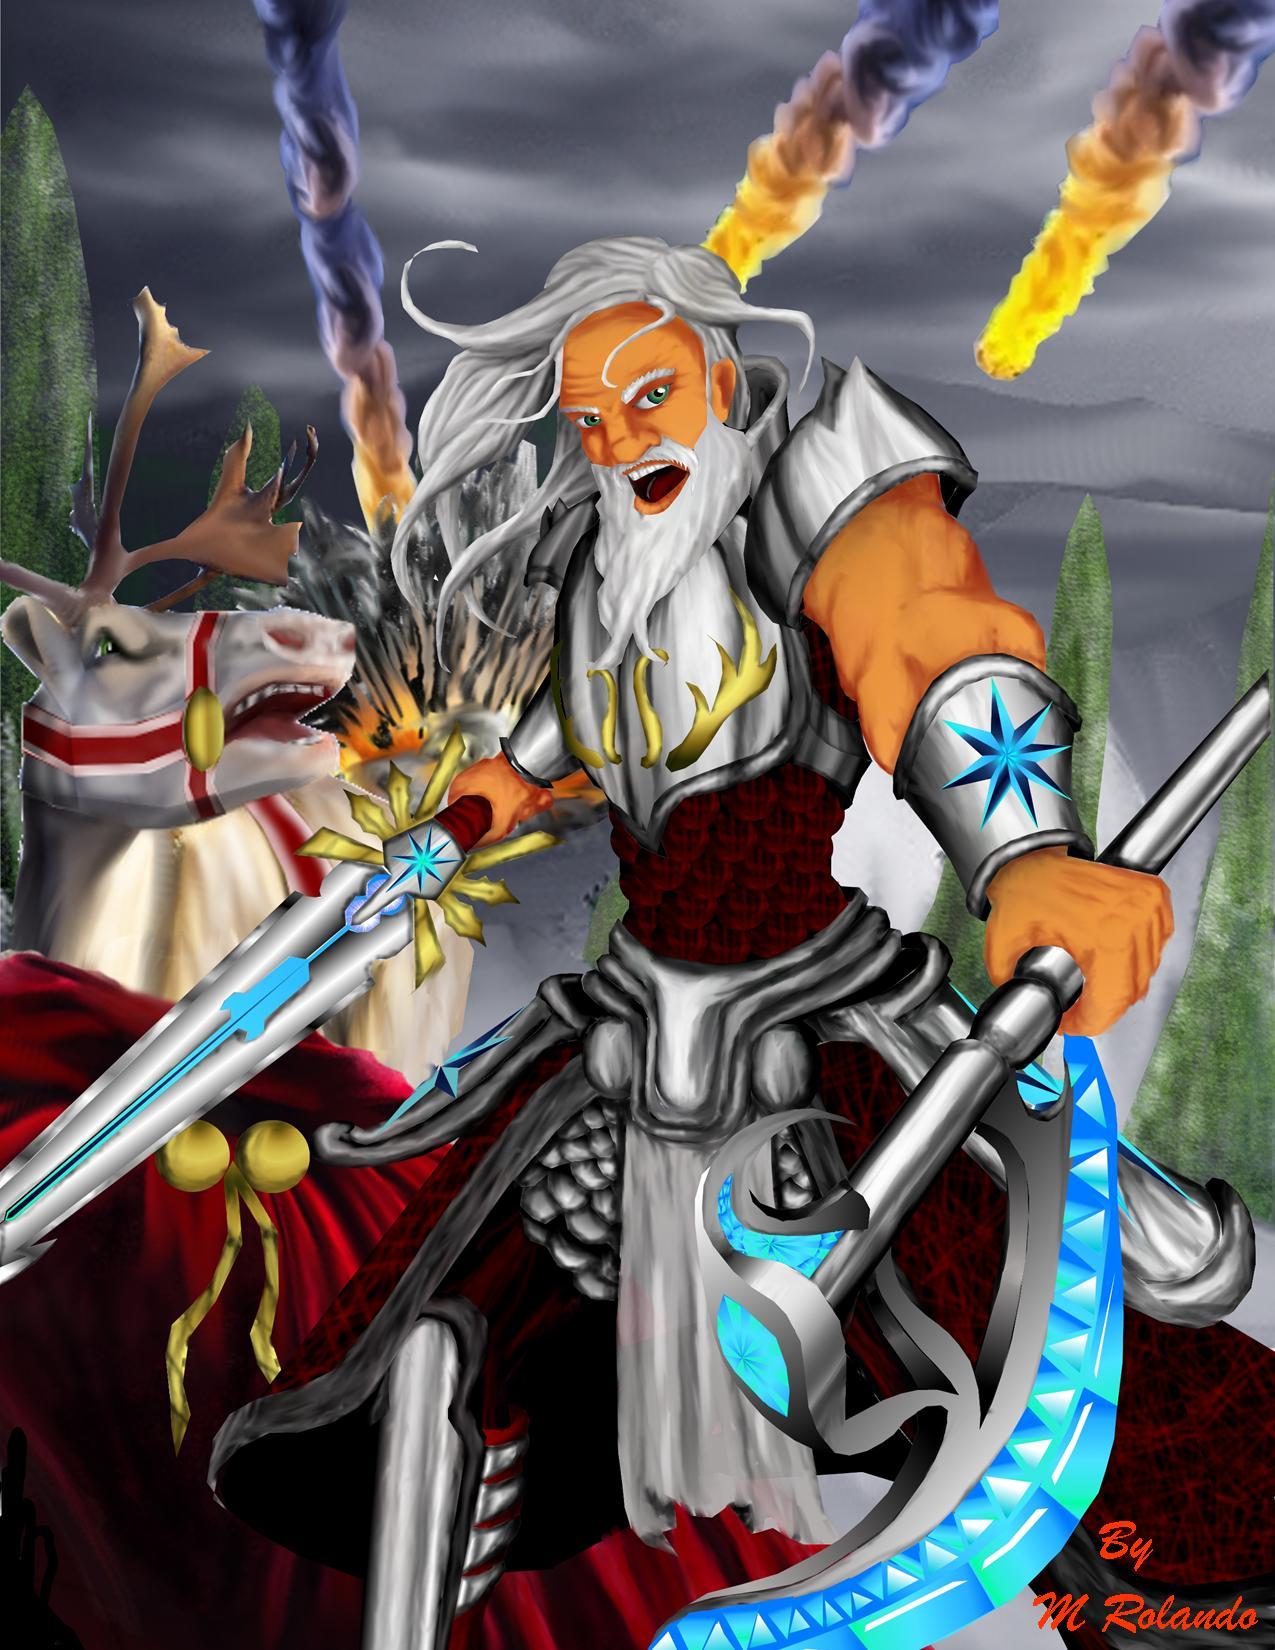 Epic Santa dicember challenger 2015